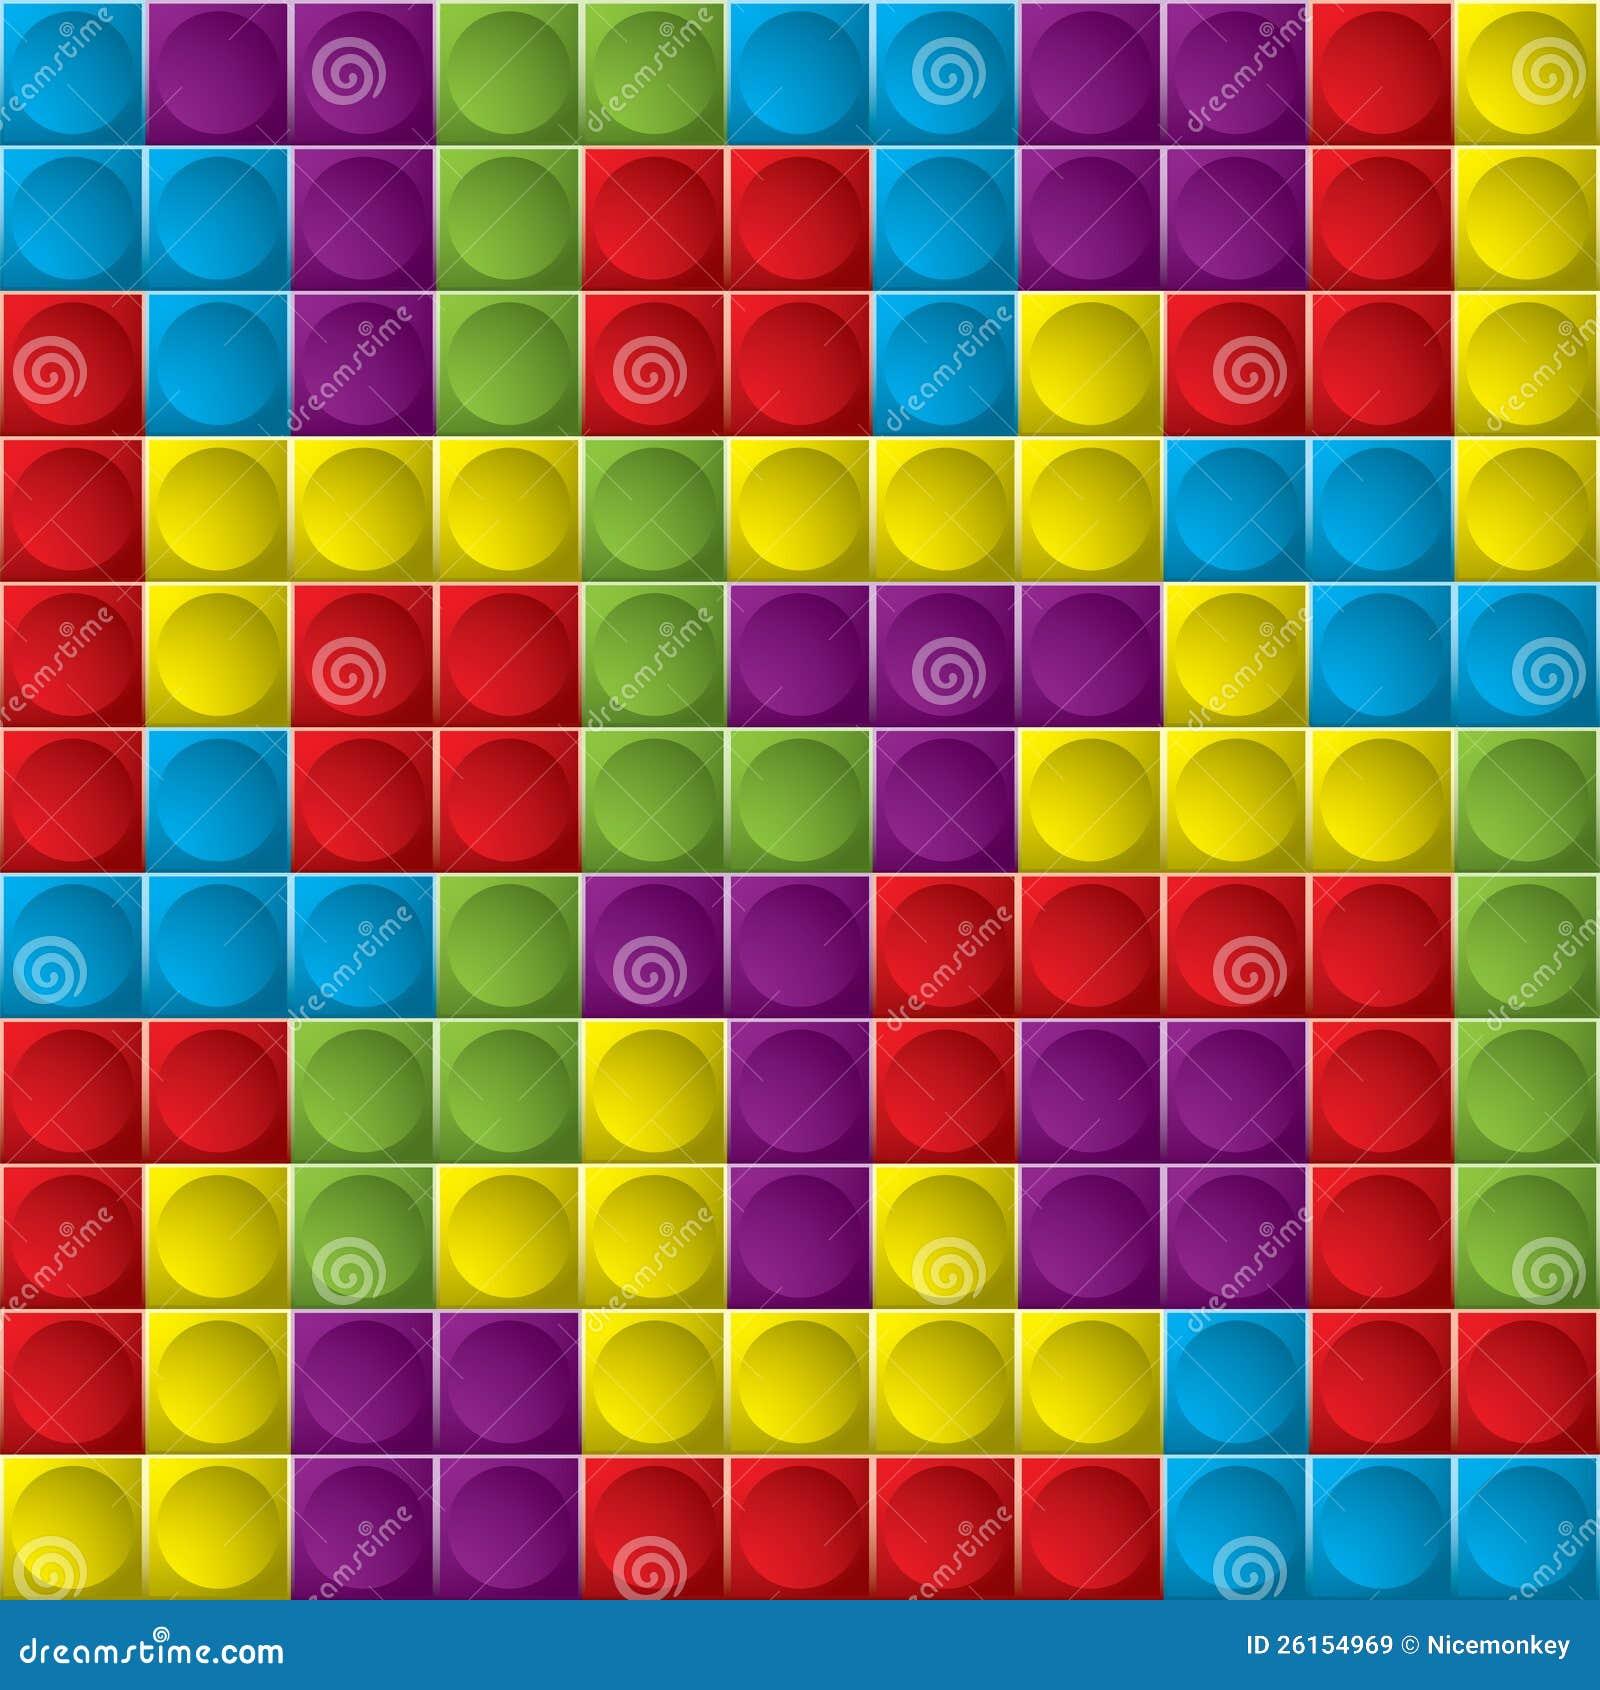 Tetris board background stock illustration  Illustration of mosaic